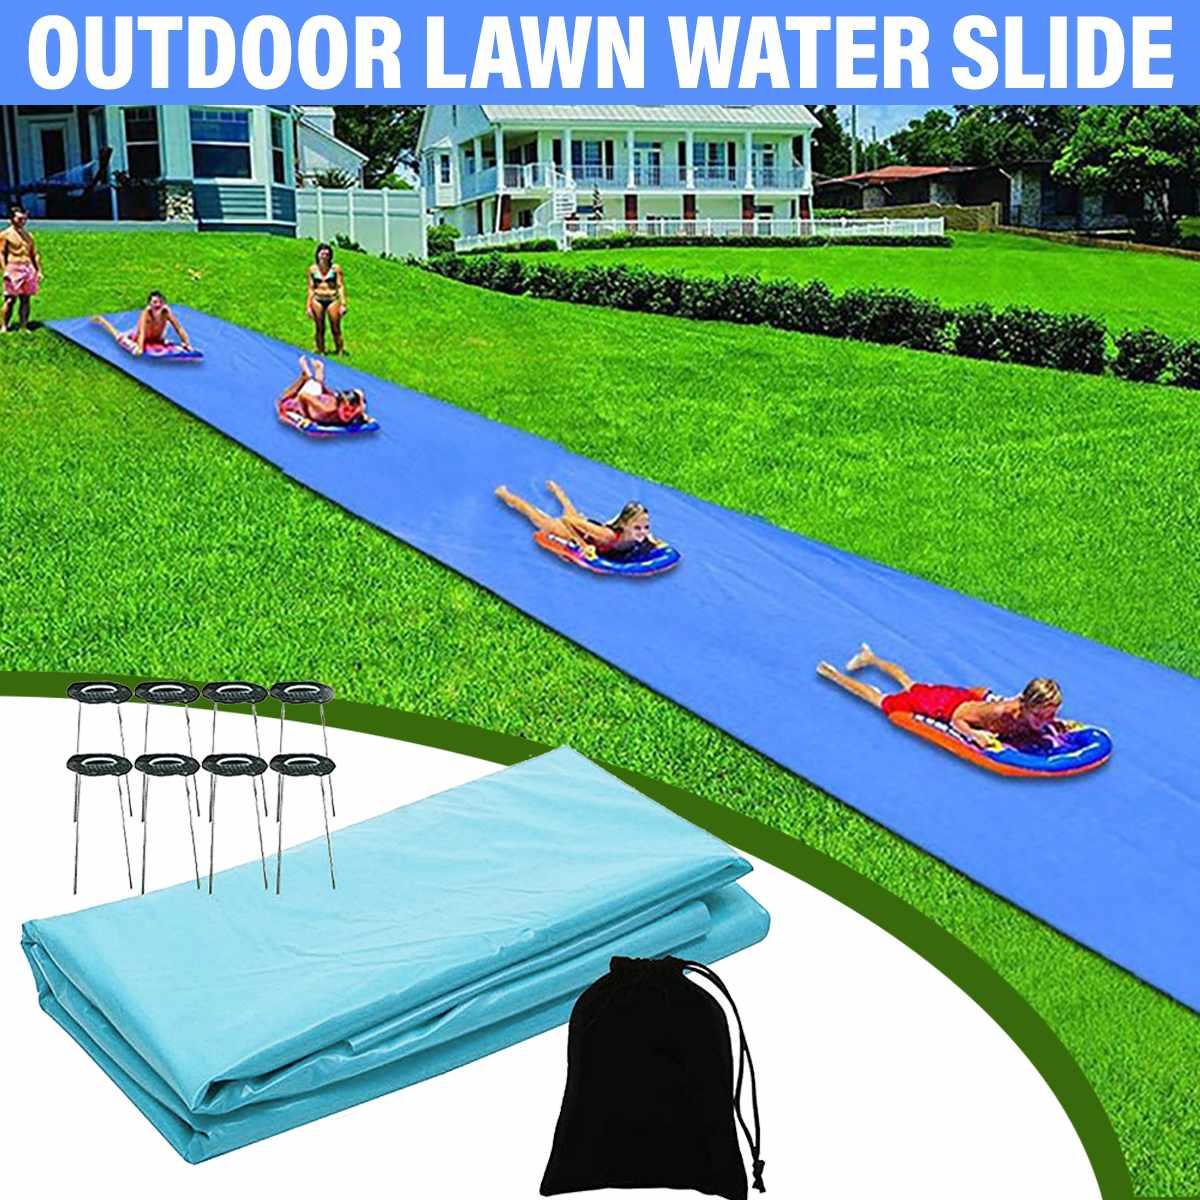 8M Double Single Inflatable Water Slide Mat Summer Waterskiing Splash Play Toys Outdoor Surfboard Summer Water Games